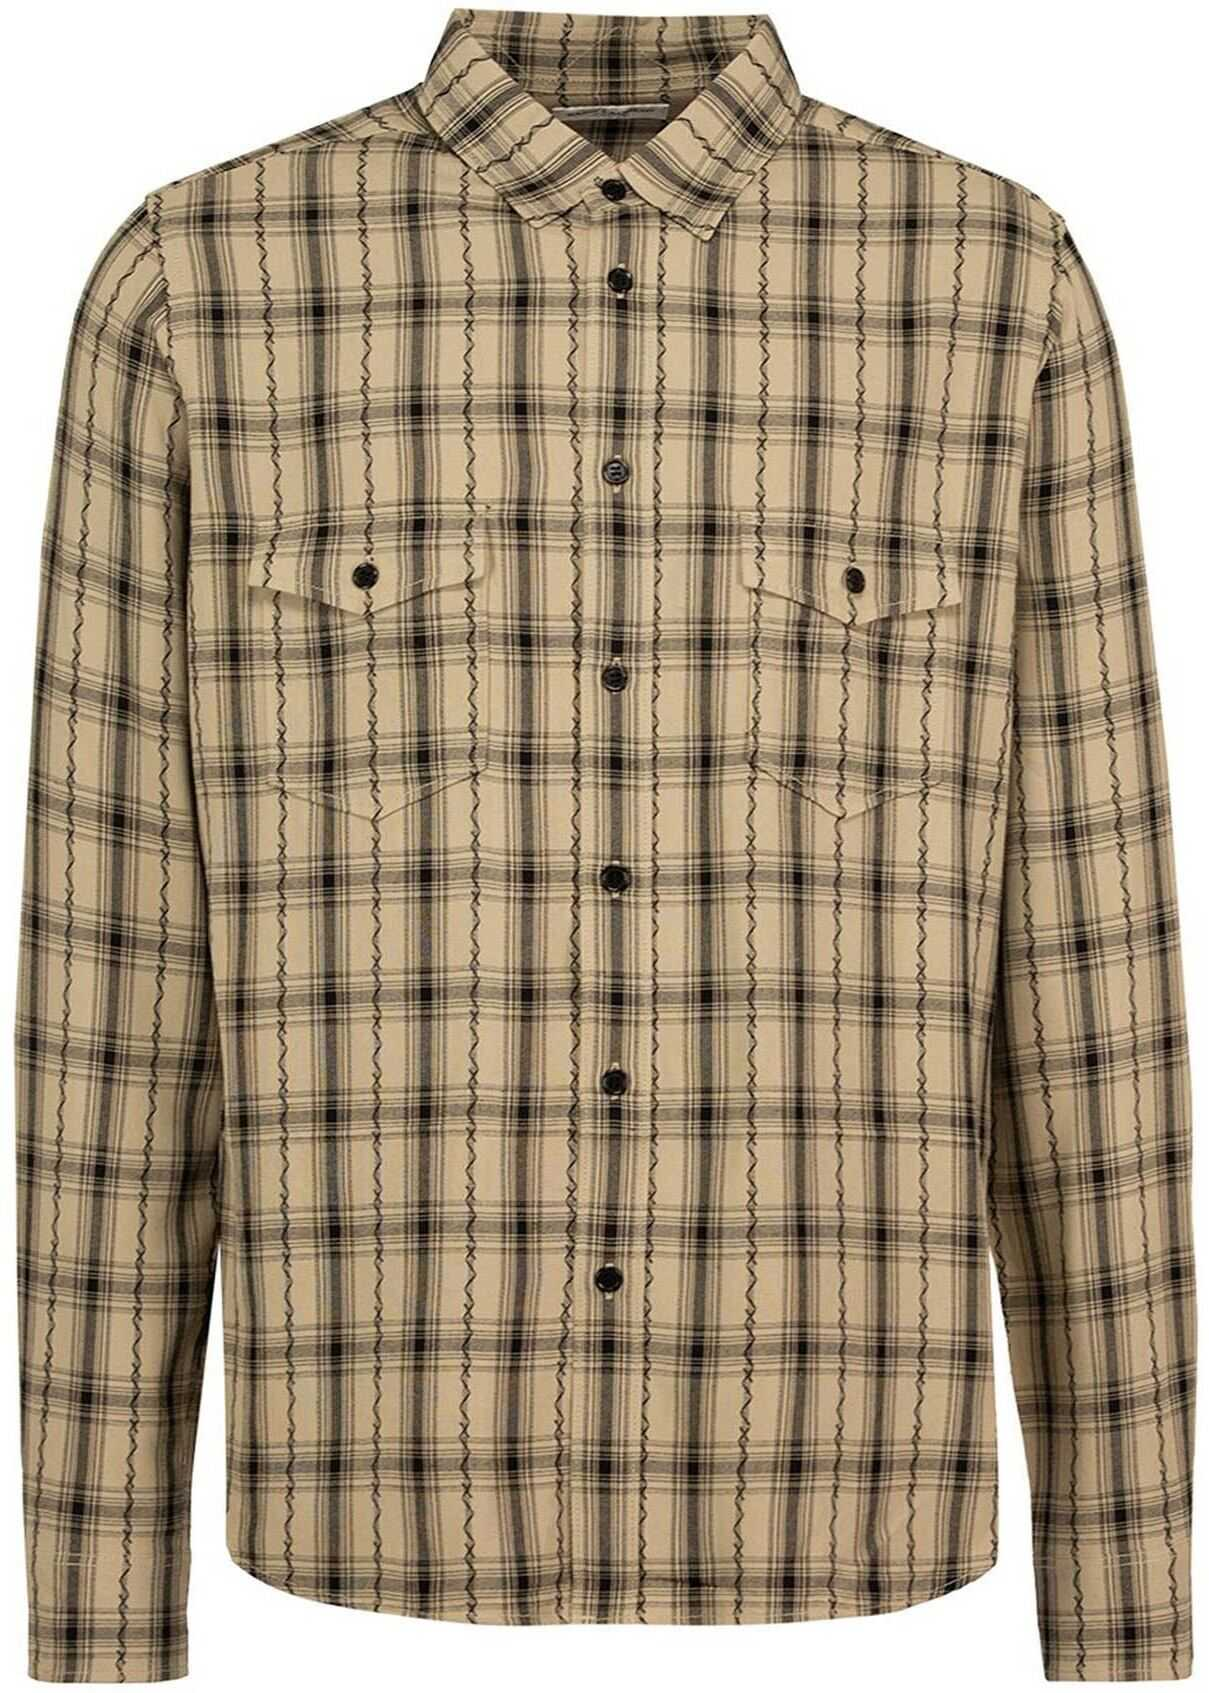 Saint Laurent Plaid Shirt In Beige Beige imagine